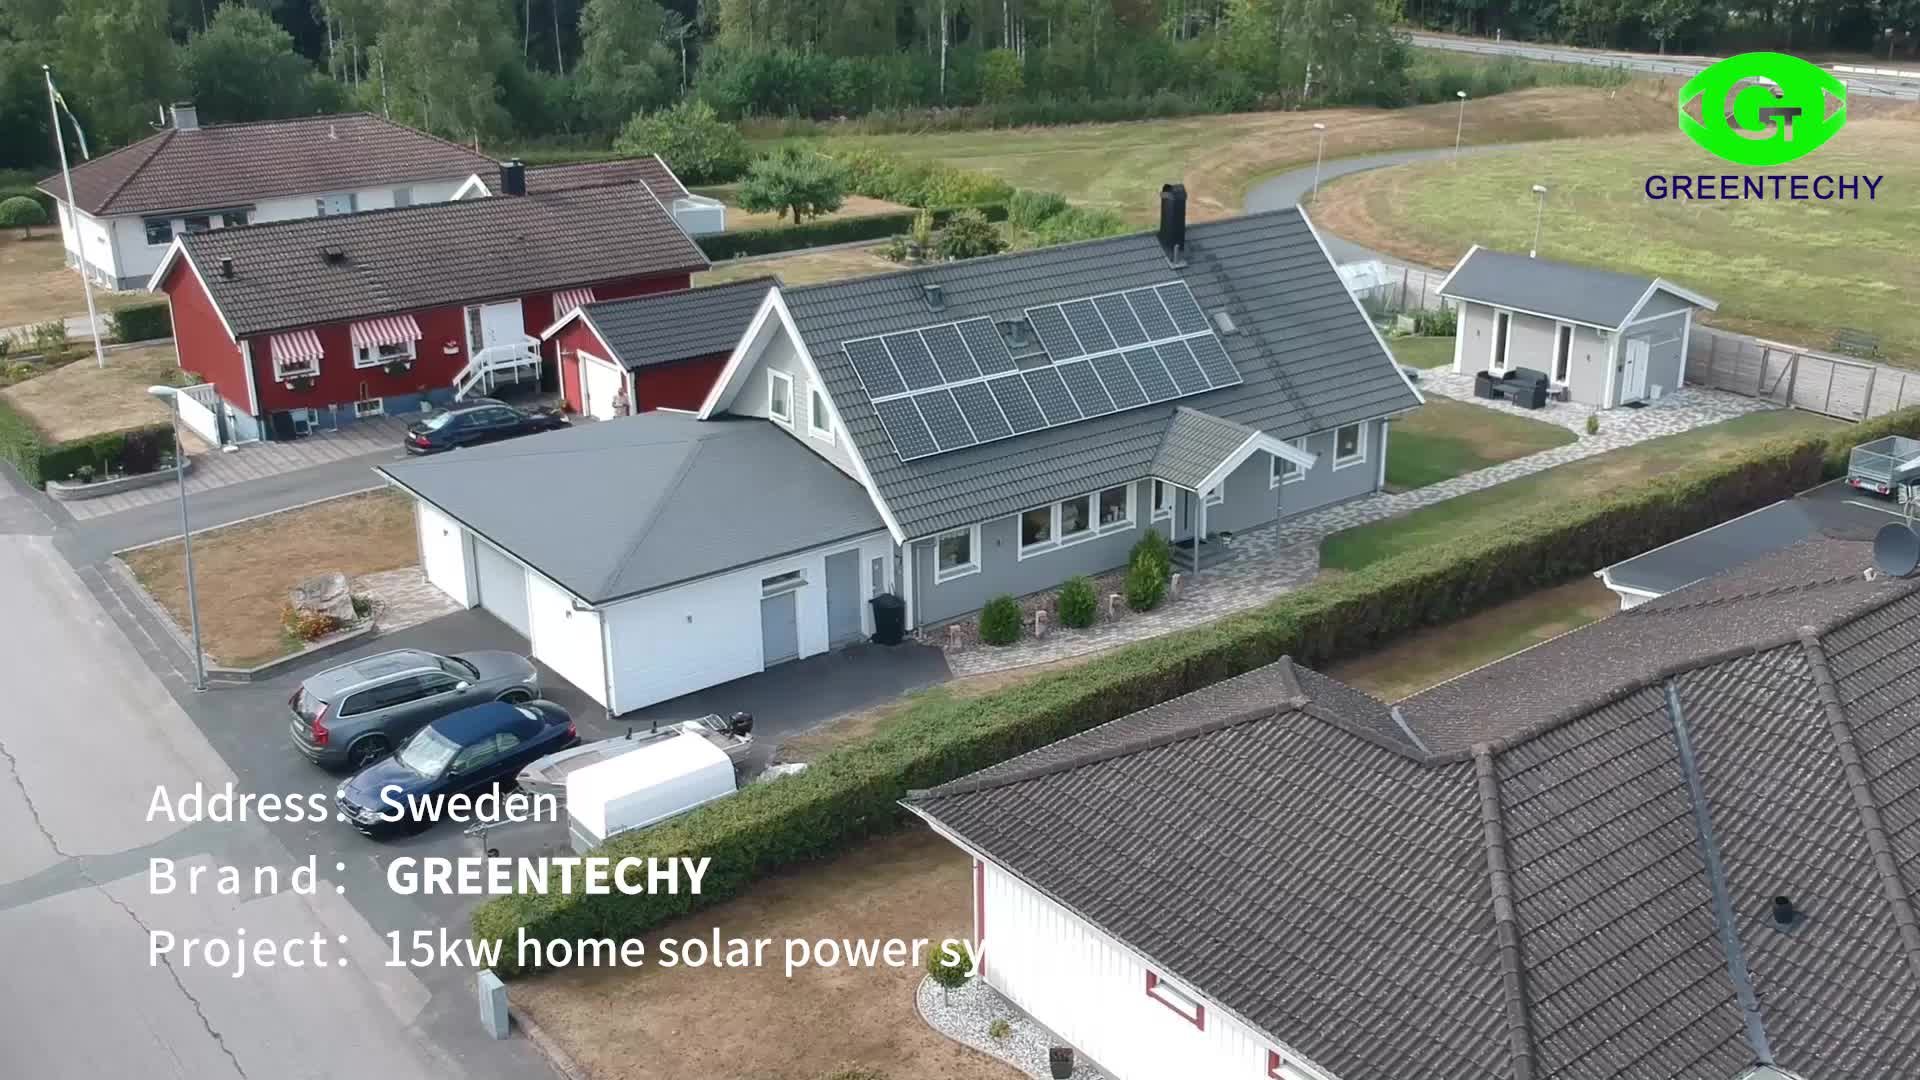 3kW กังหันลม WIND เครื่องกำเนิดไฟฟ้า 7kw พลังงานแสงอาทิตย์แผง 10KW SOLAR WIND HYBRID Power ระบบ